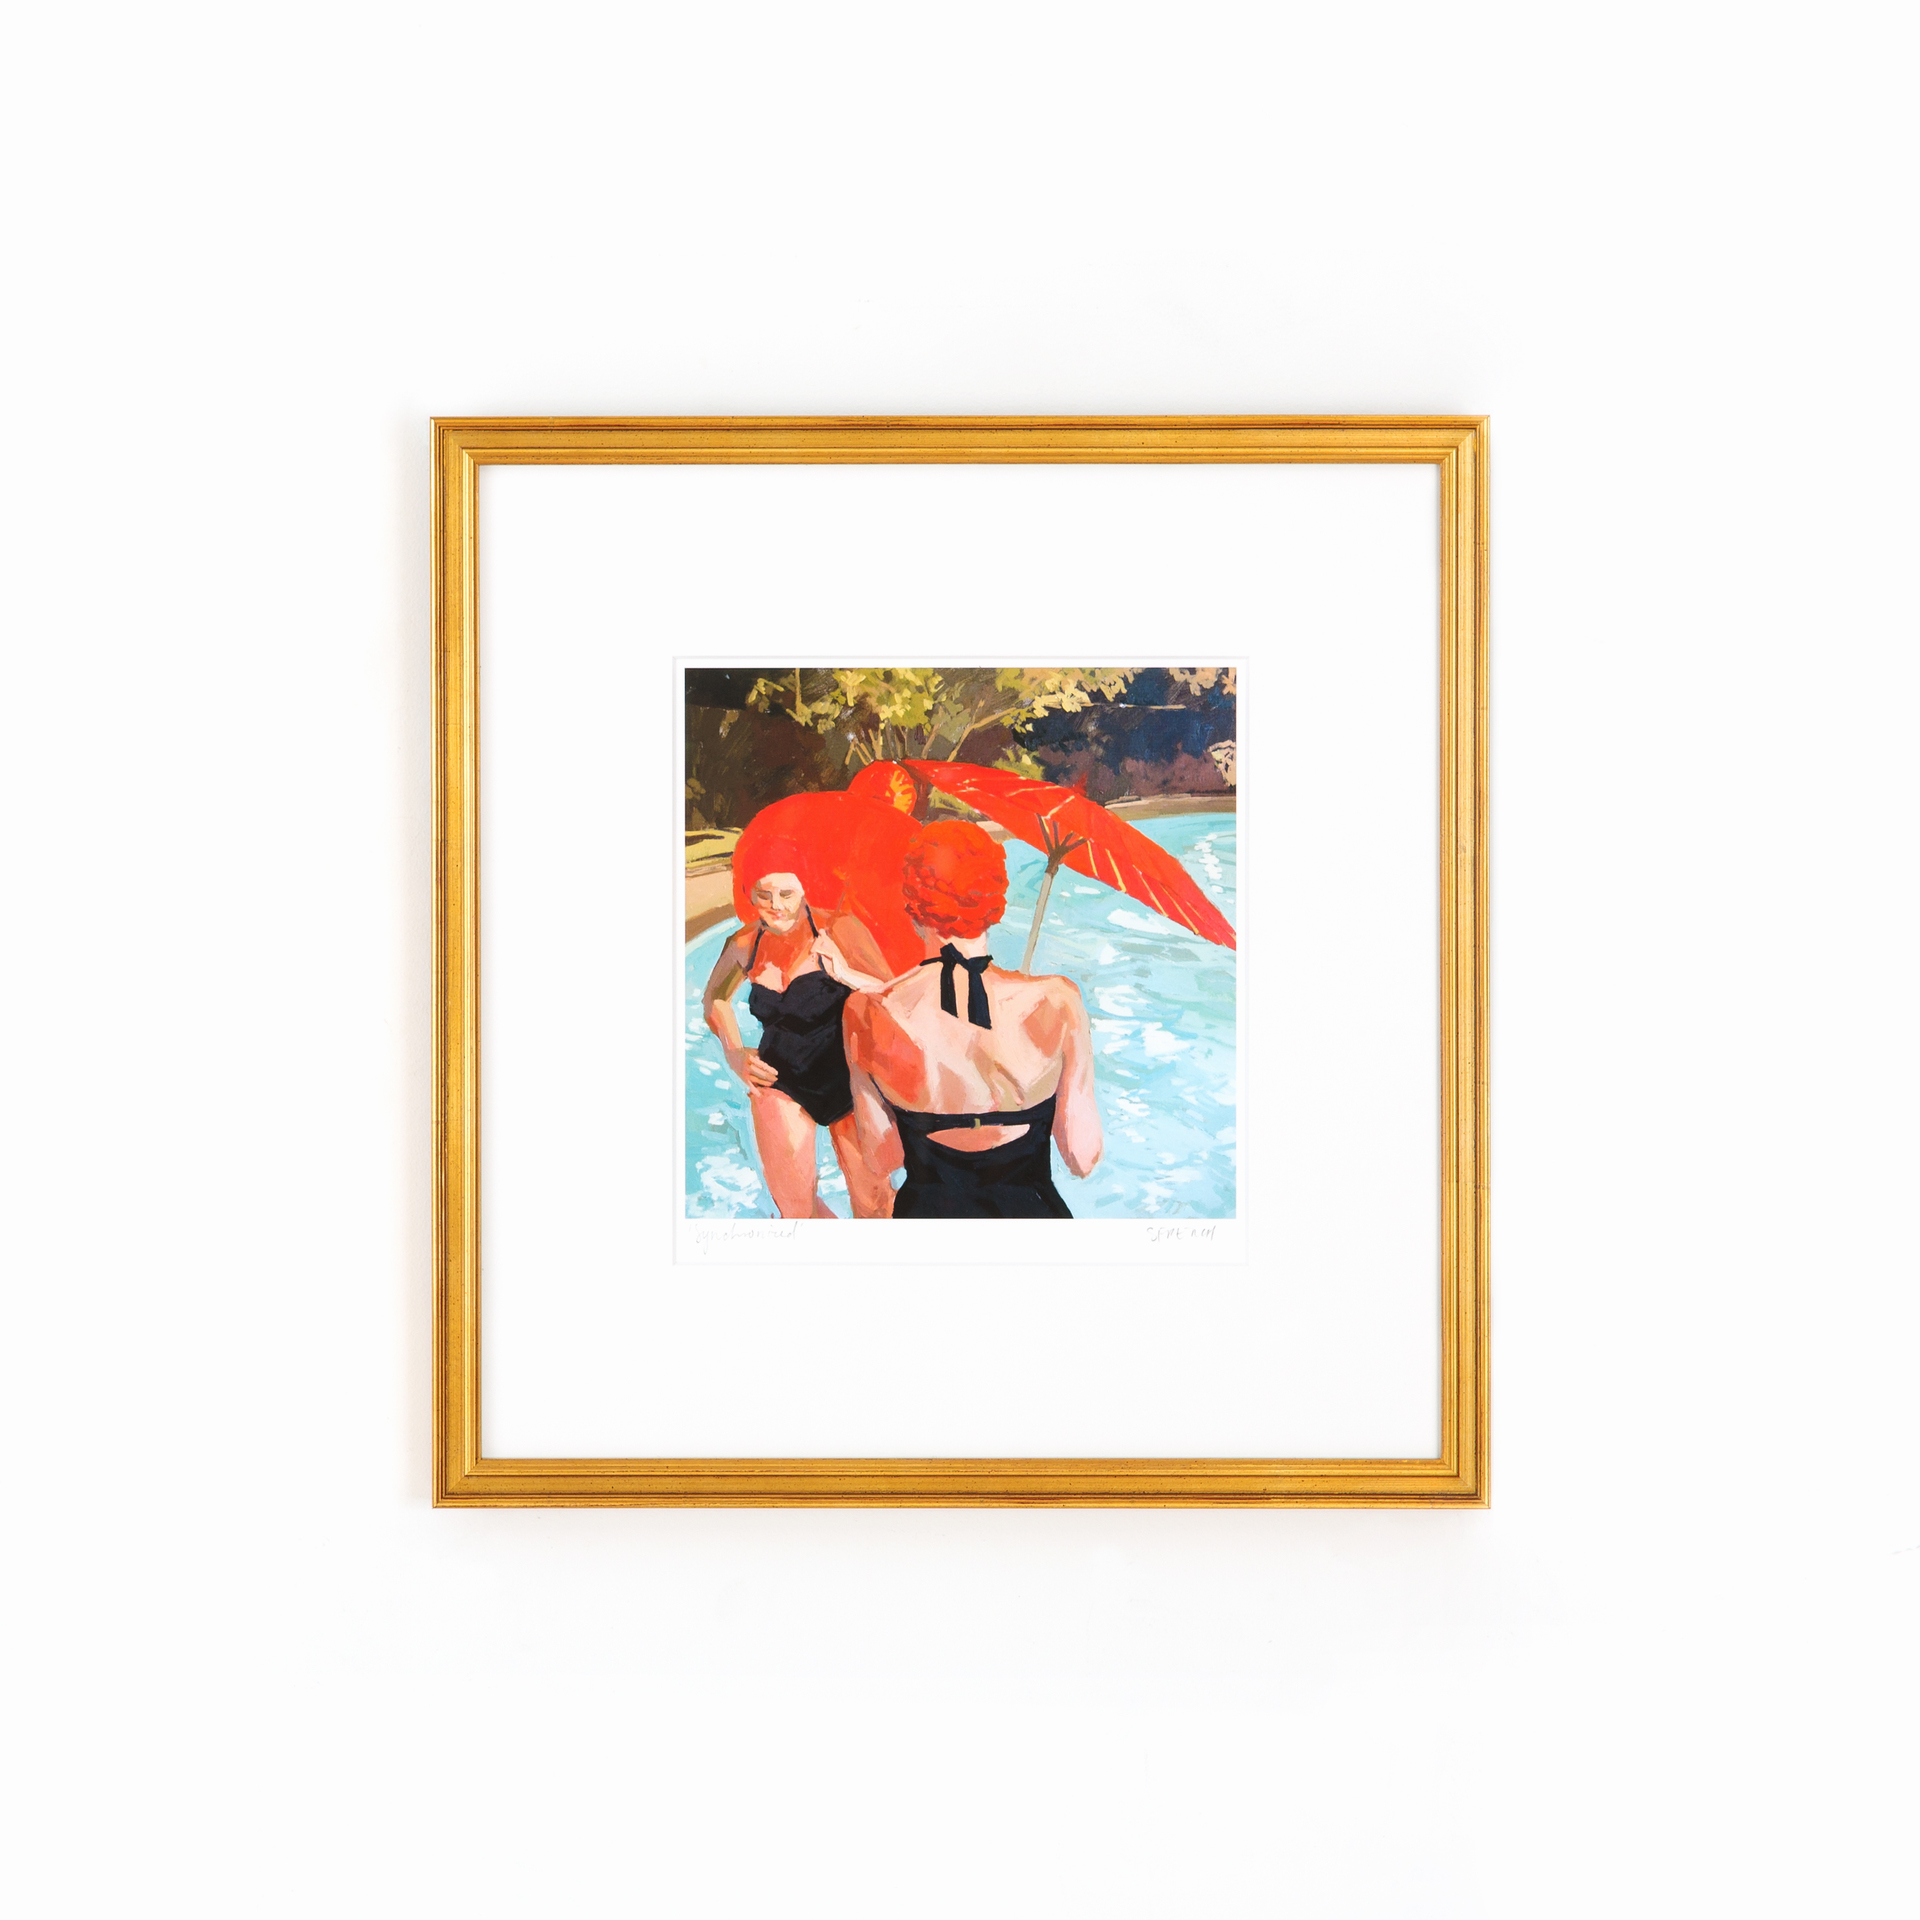 Antiqued Gold Frame   Classic frame for family photos.